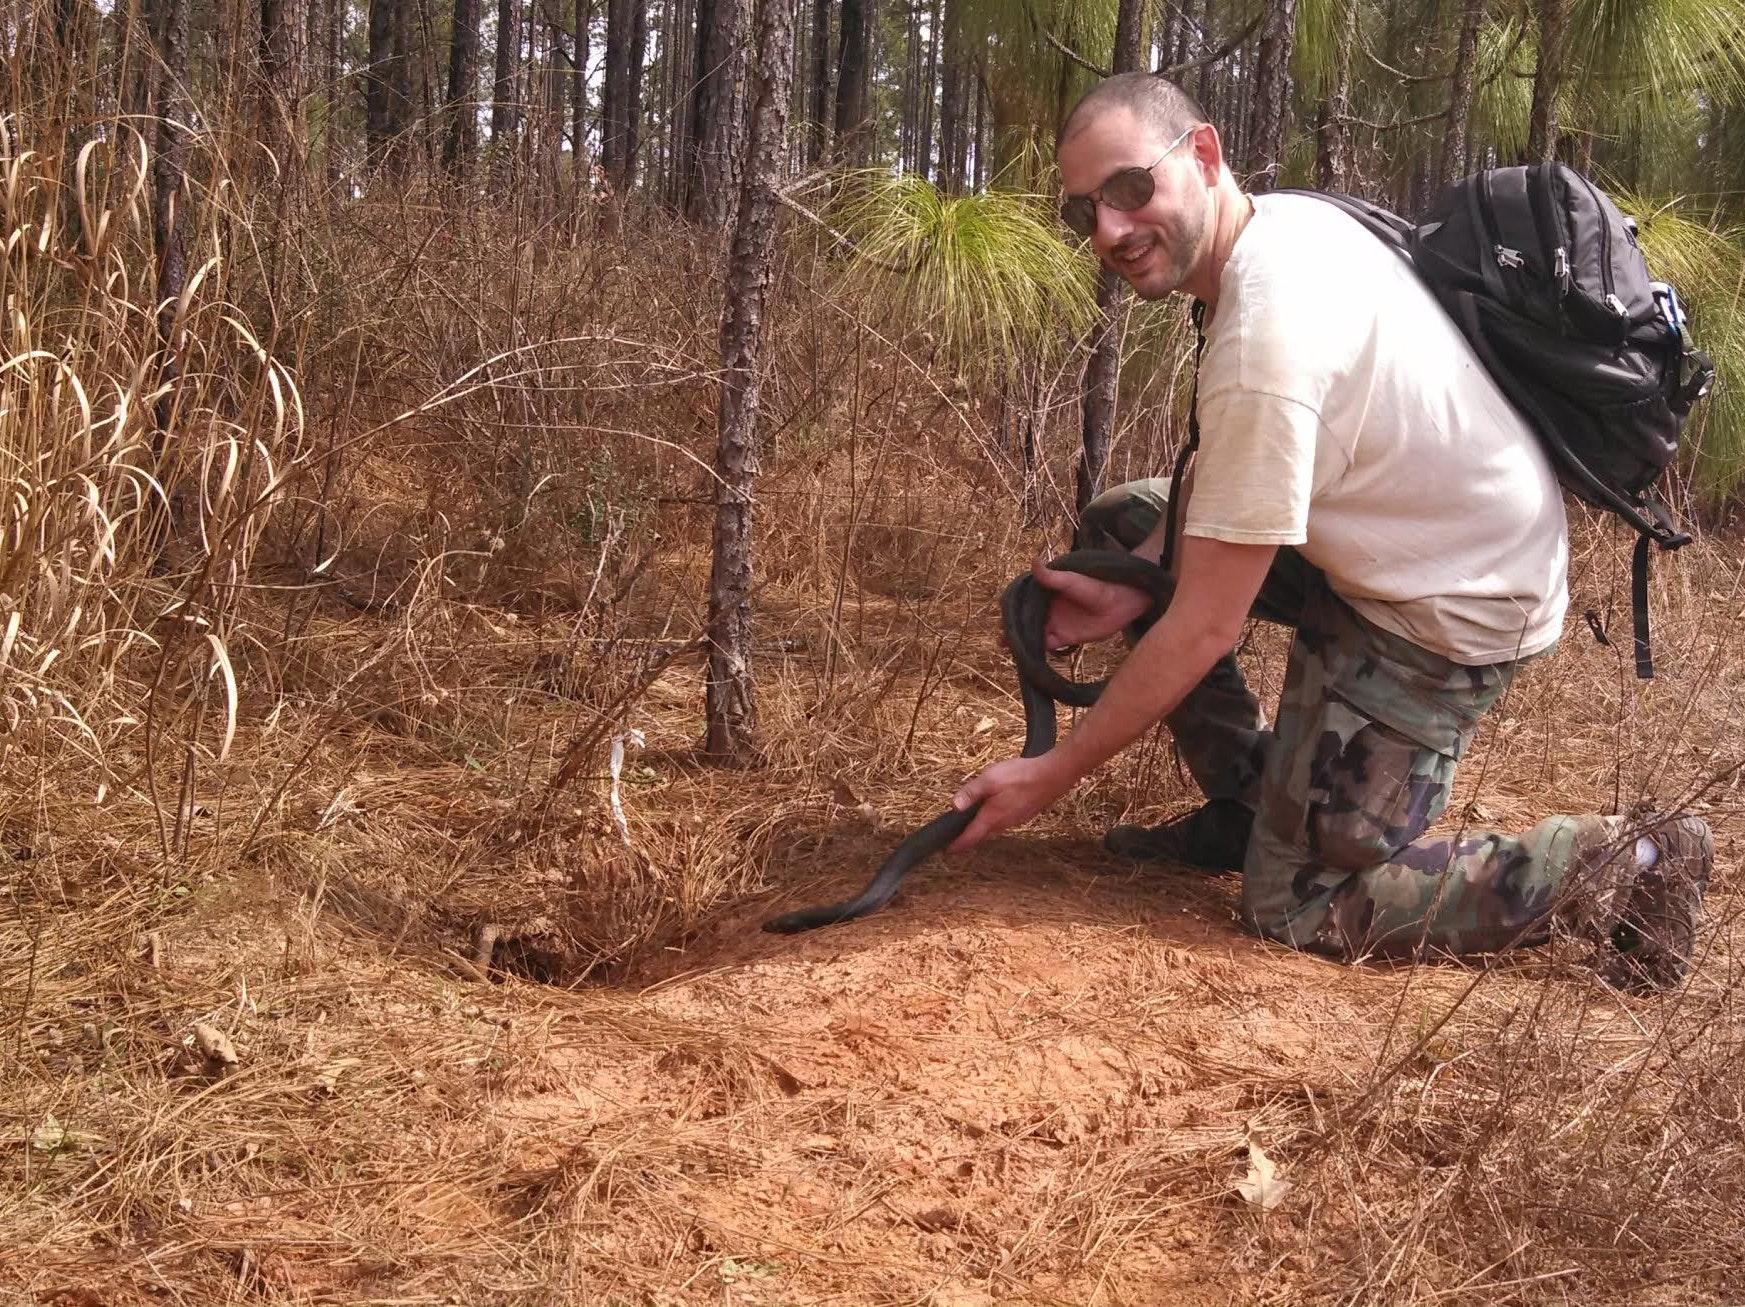 Meet Dr. David Steen, the Man Saving Snakes on Twitter